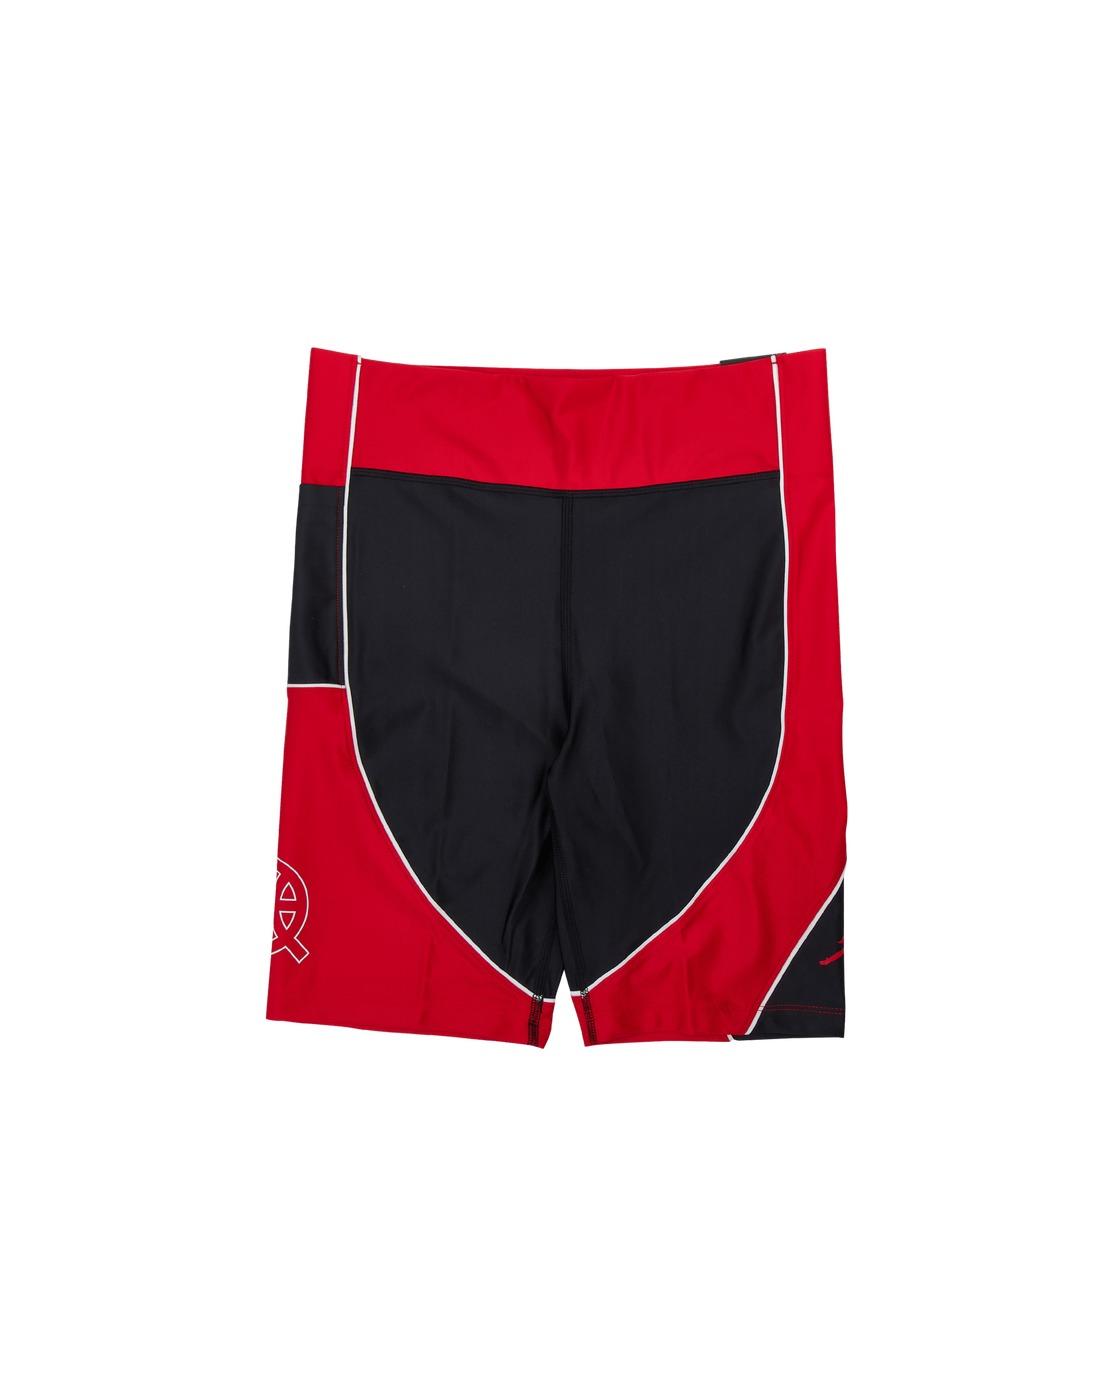 Photo: Nike Jordan Quai 54 Essential Bike Shorts Black/University Red